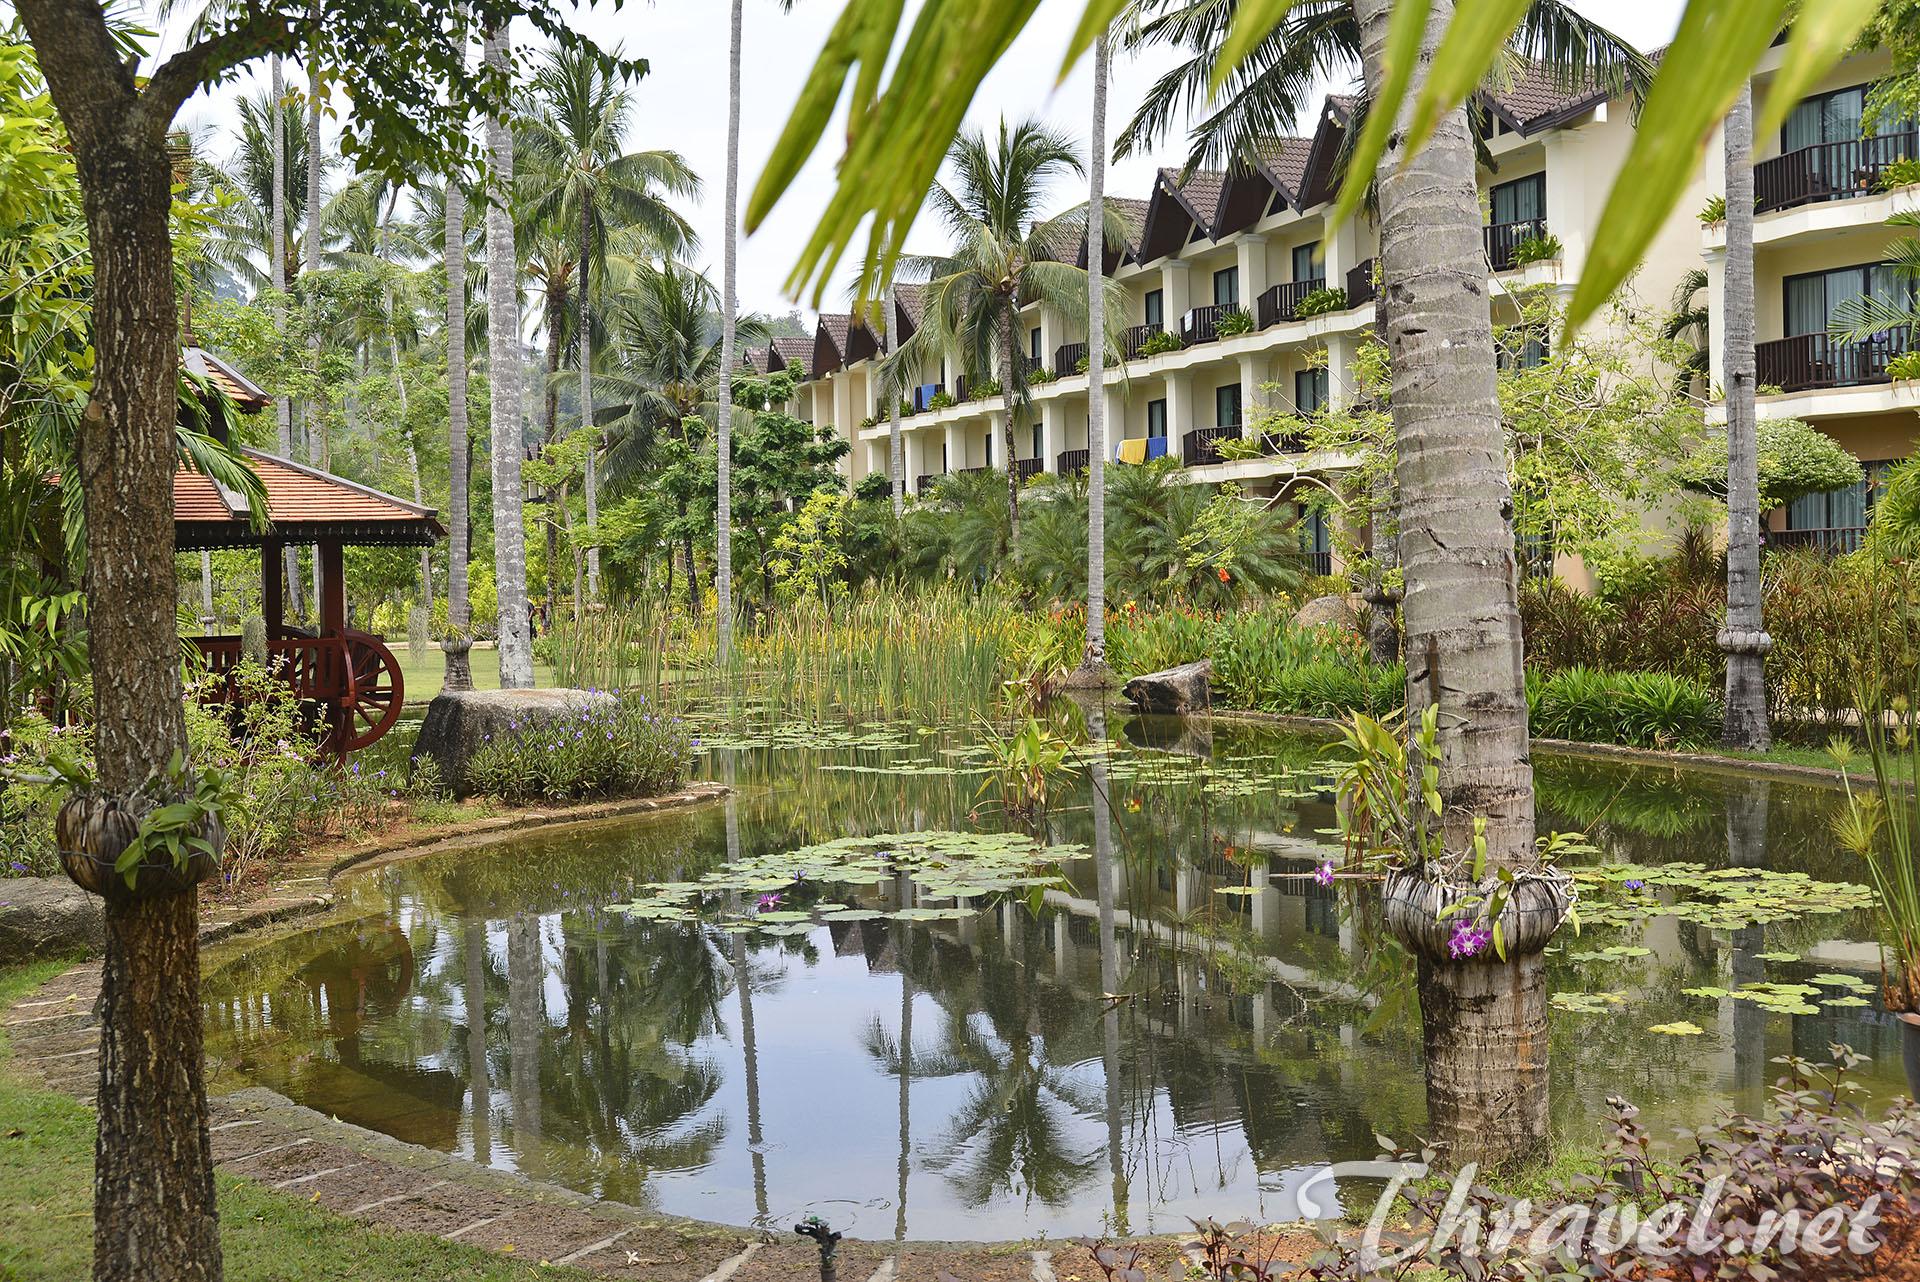 duangjitt-resort-and-spa-hotel-patong-beach-phuket-thailand-02